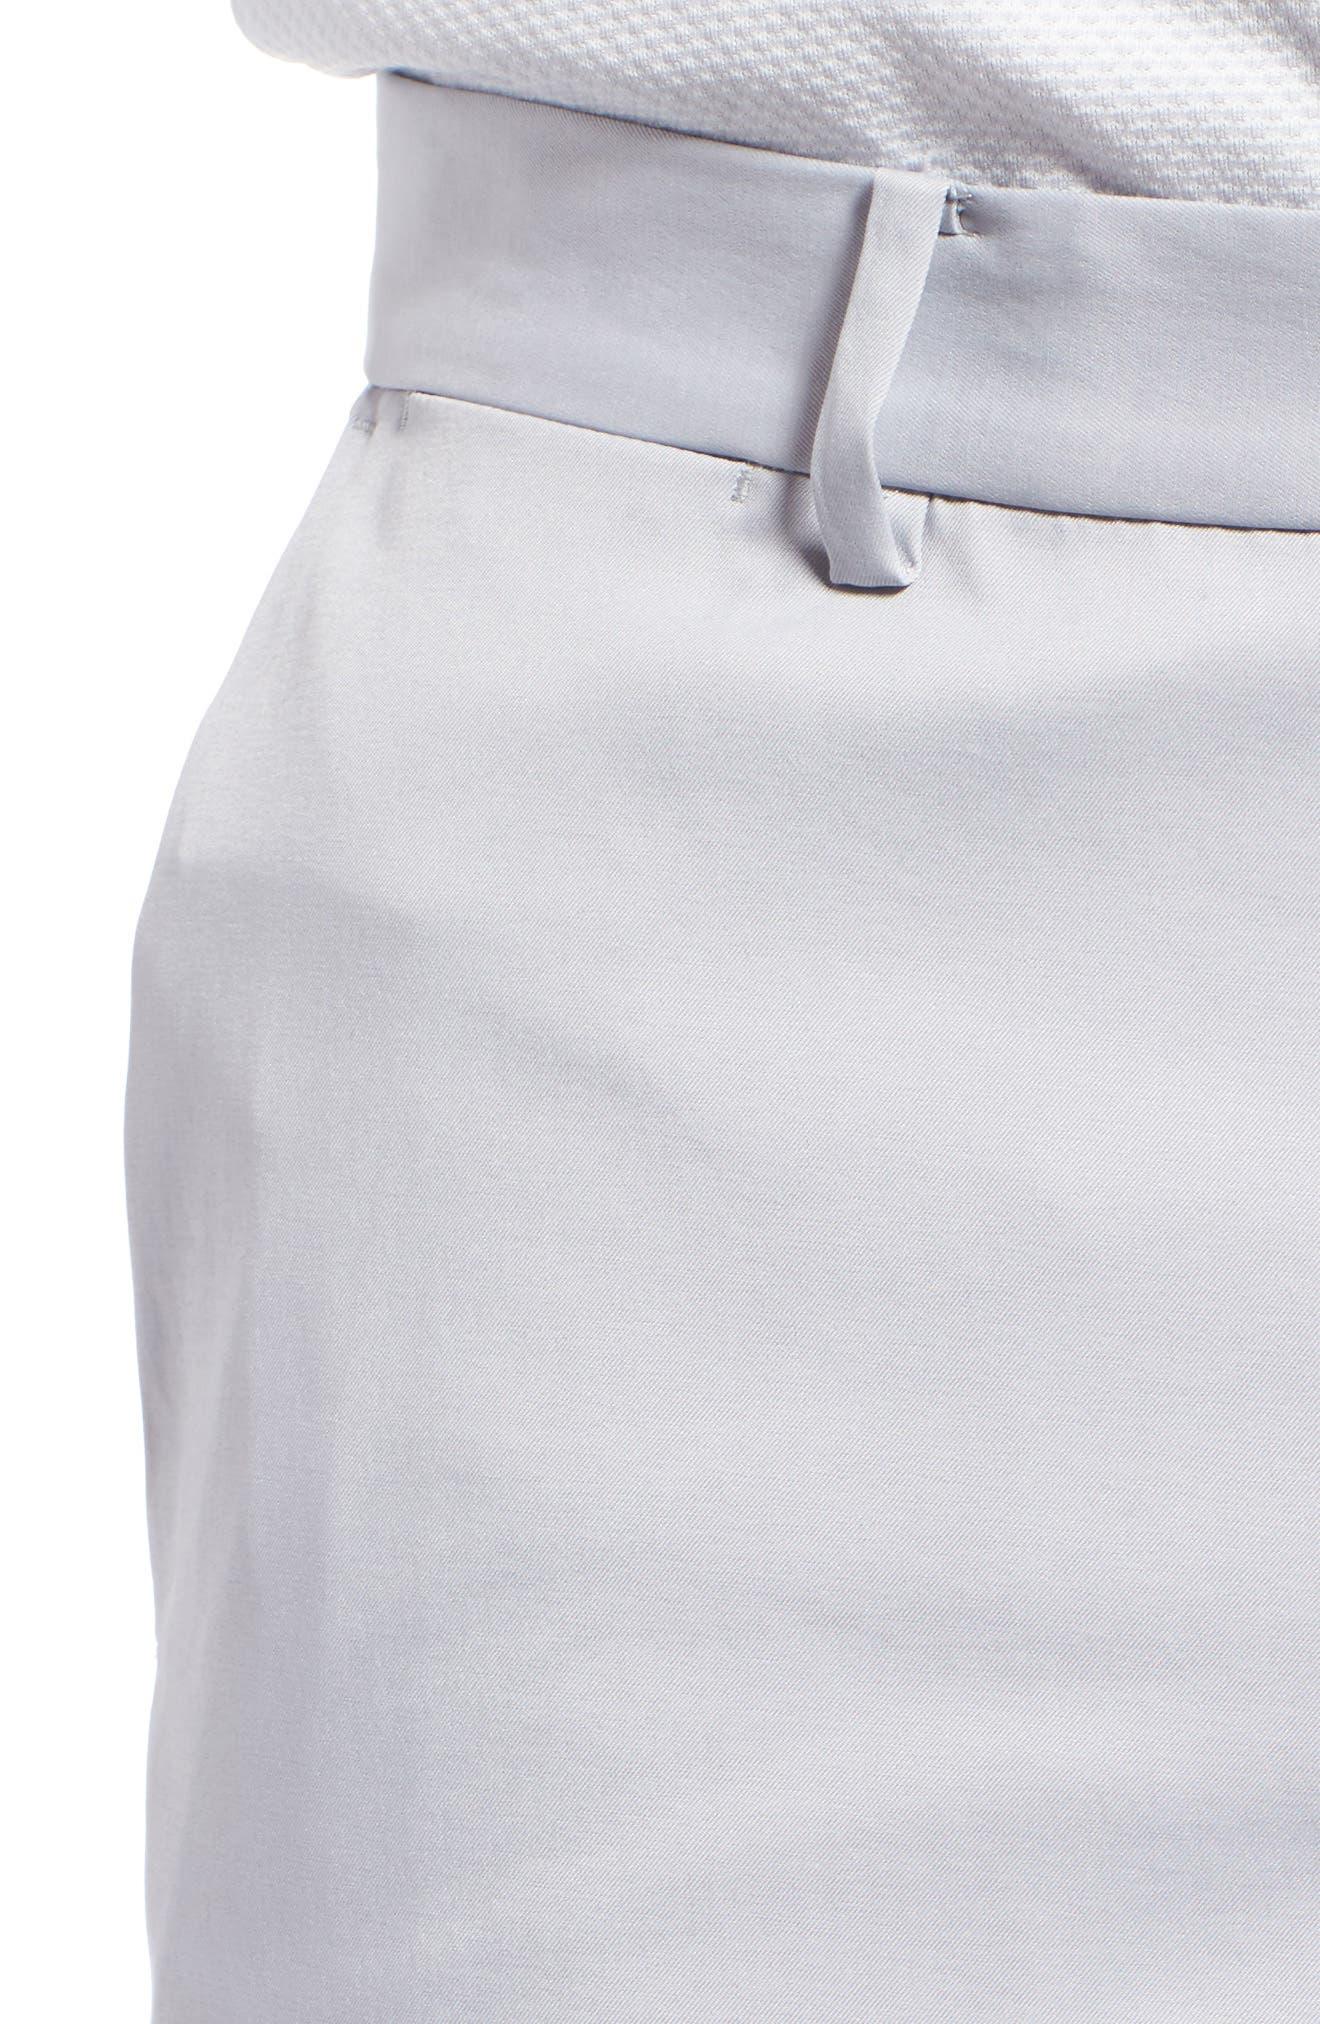 Flat Front Golf Shorts,                             Alternate thumbnail 29, color,